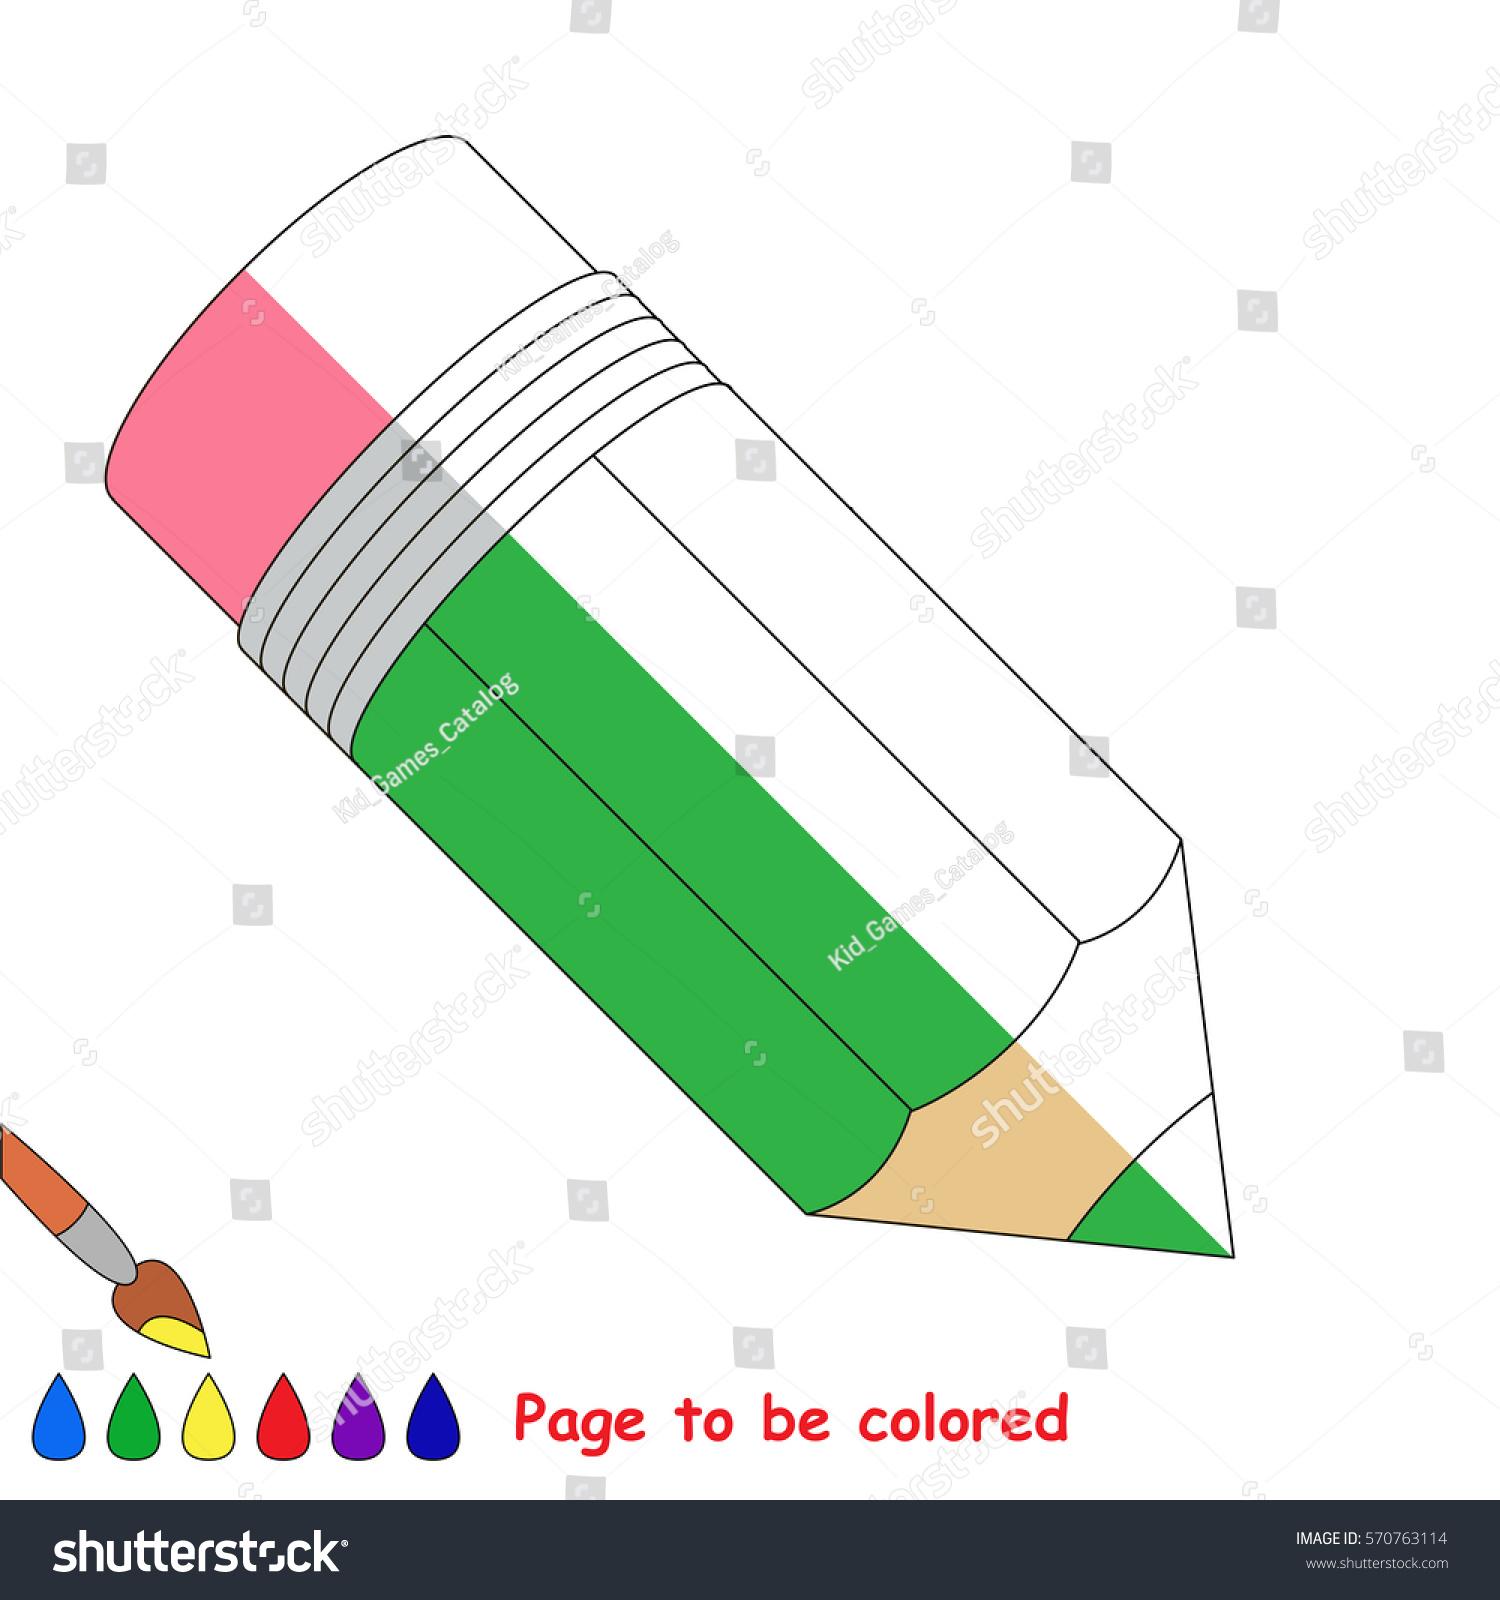 Pencil Coloring Book Educate Preschool Kids Stock Vector 570763114 ...